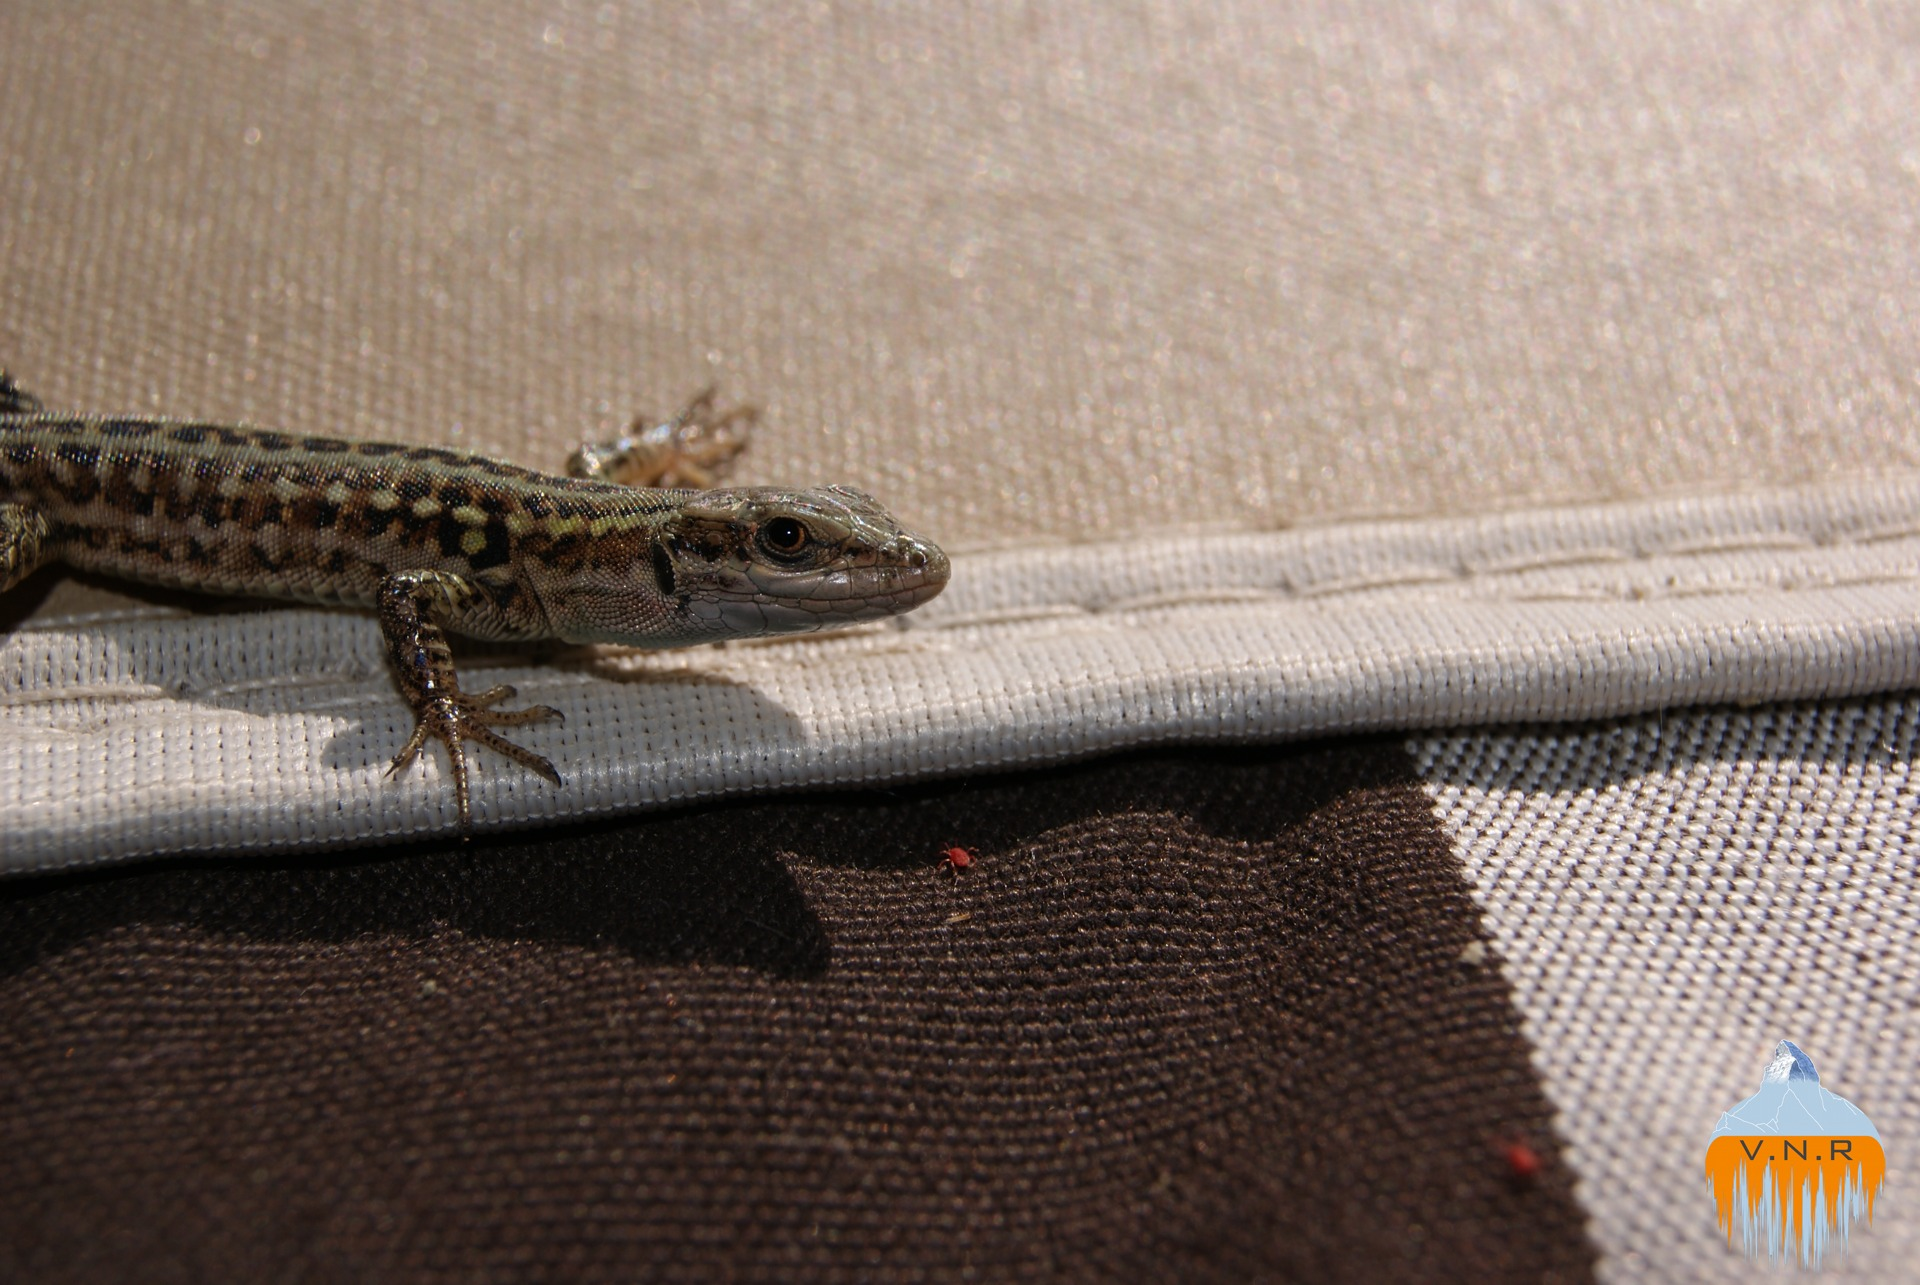 Italian lizard